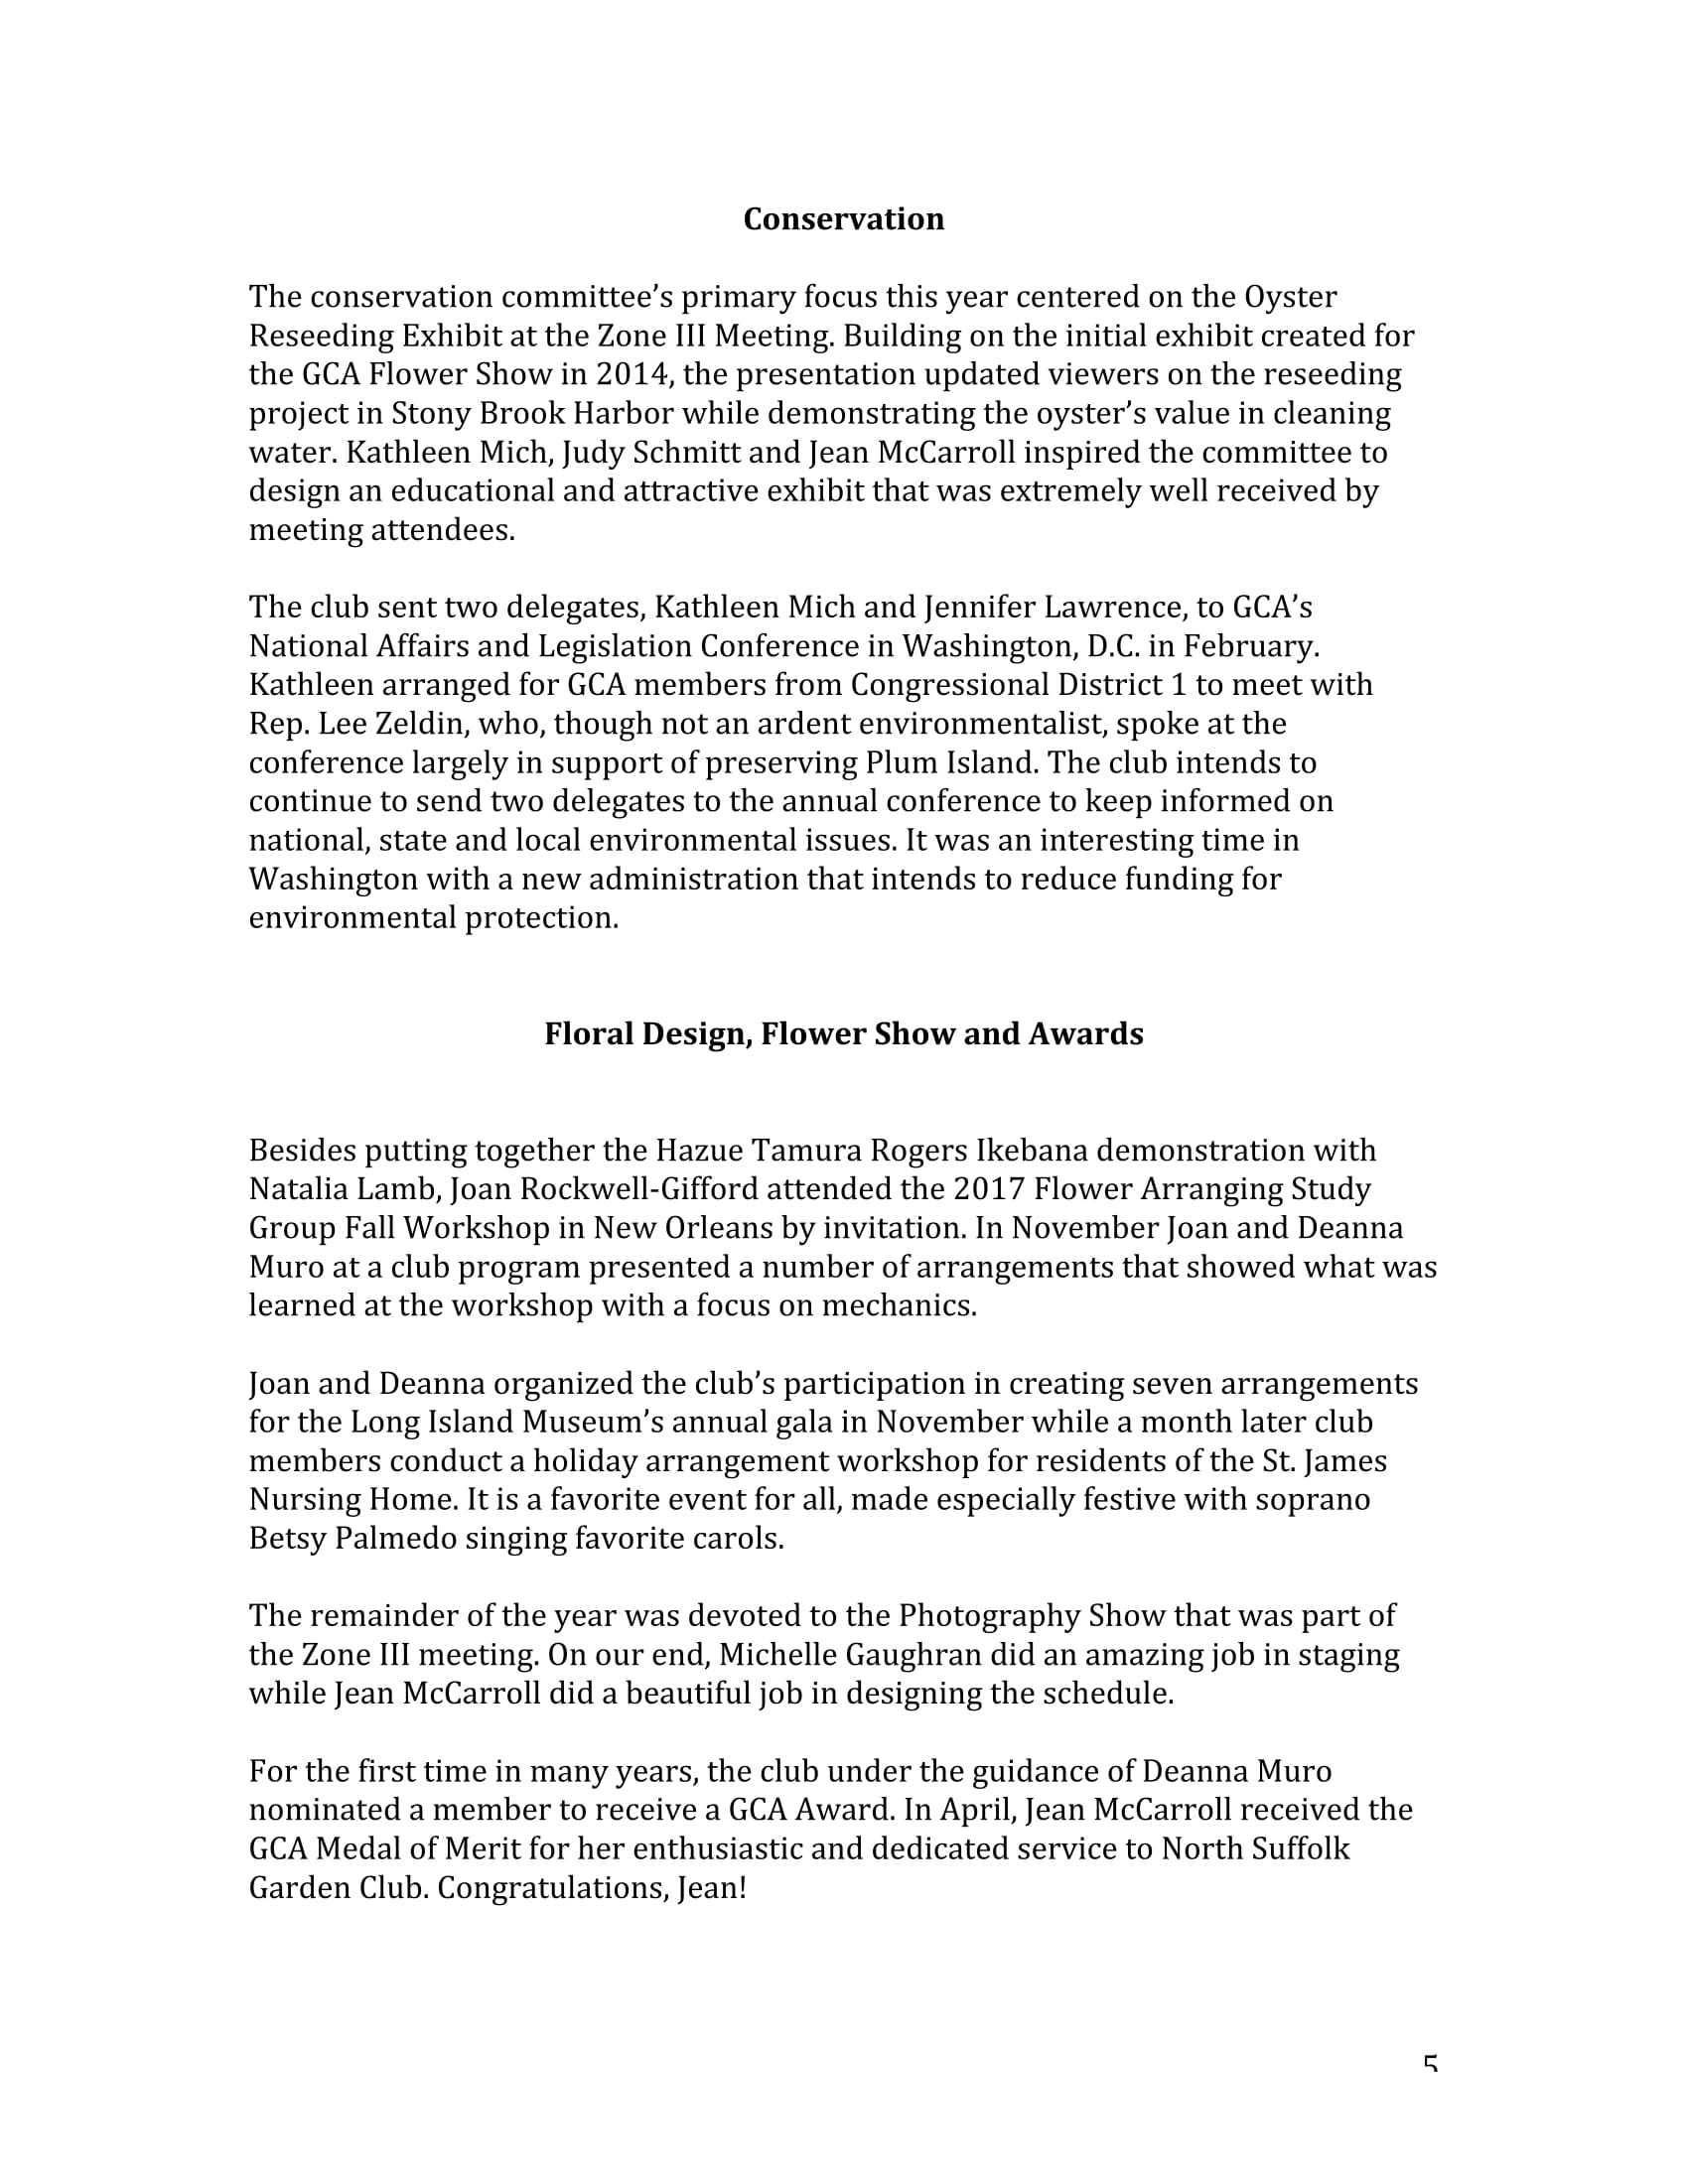 NSGC Annual Report-05.jpg